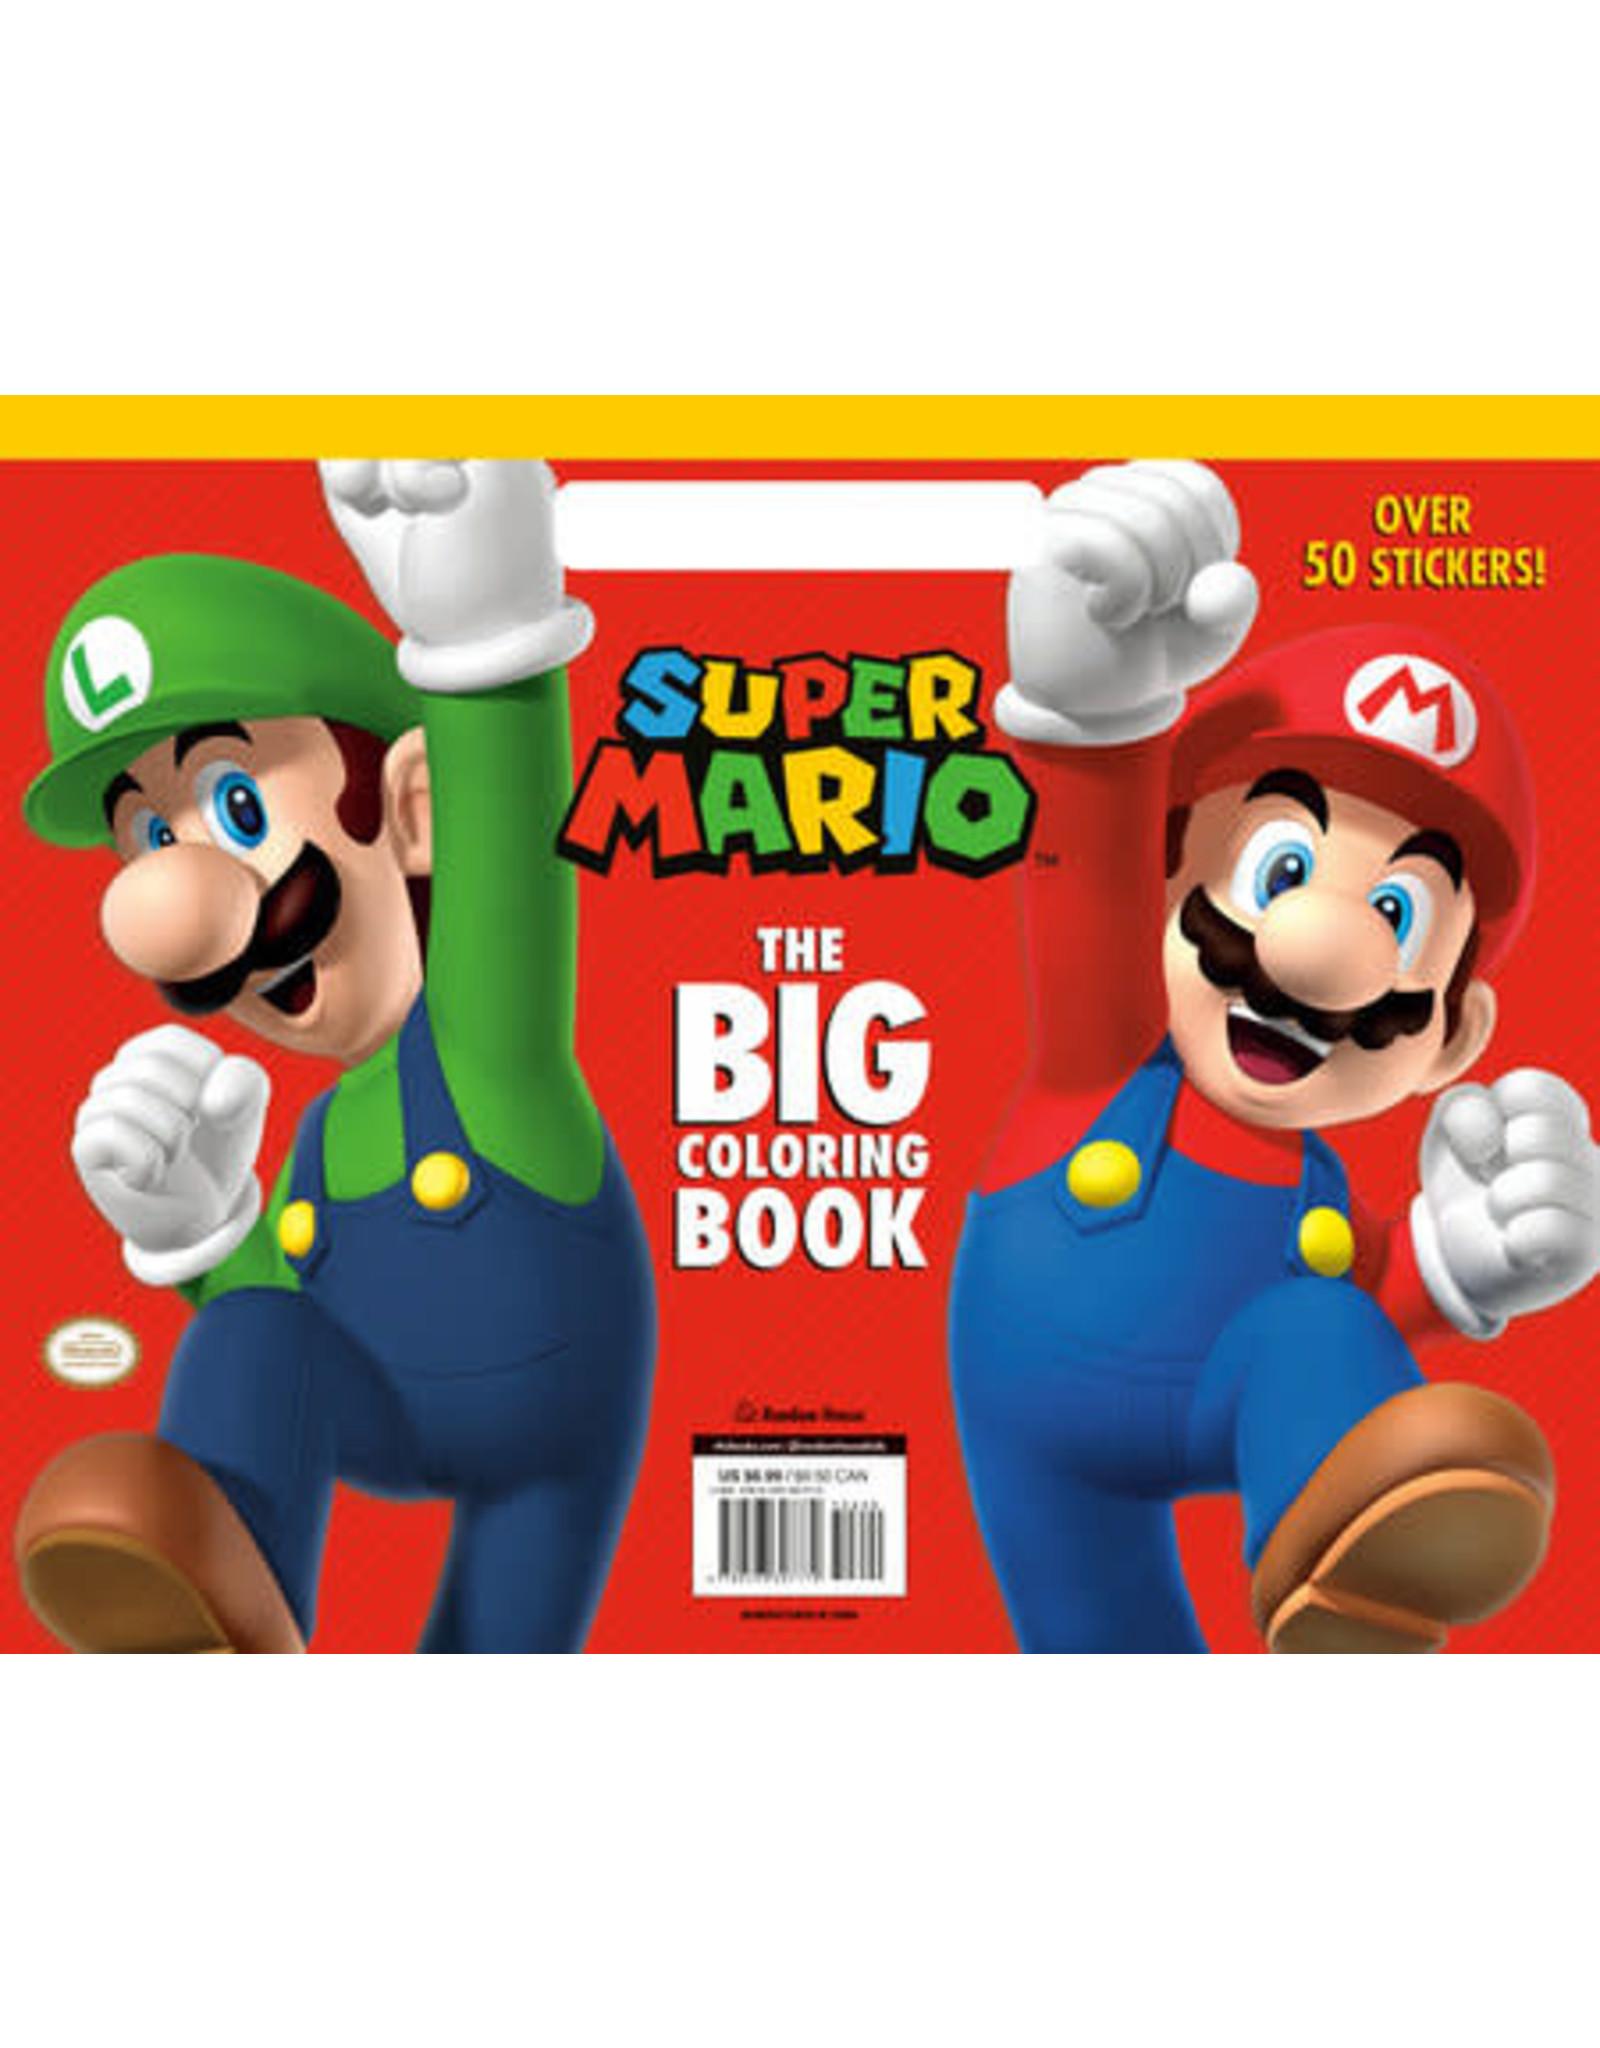 Super Mario: The Big Coloring Book